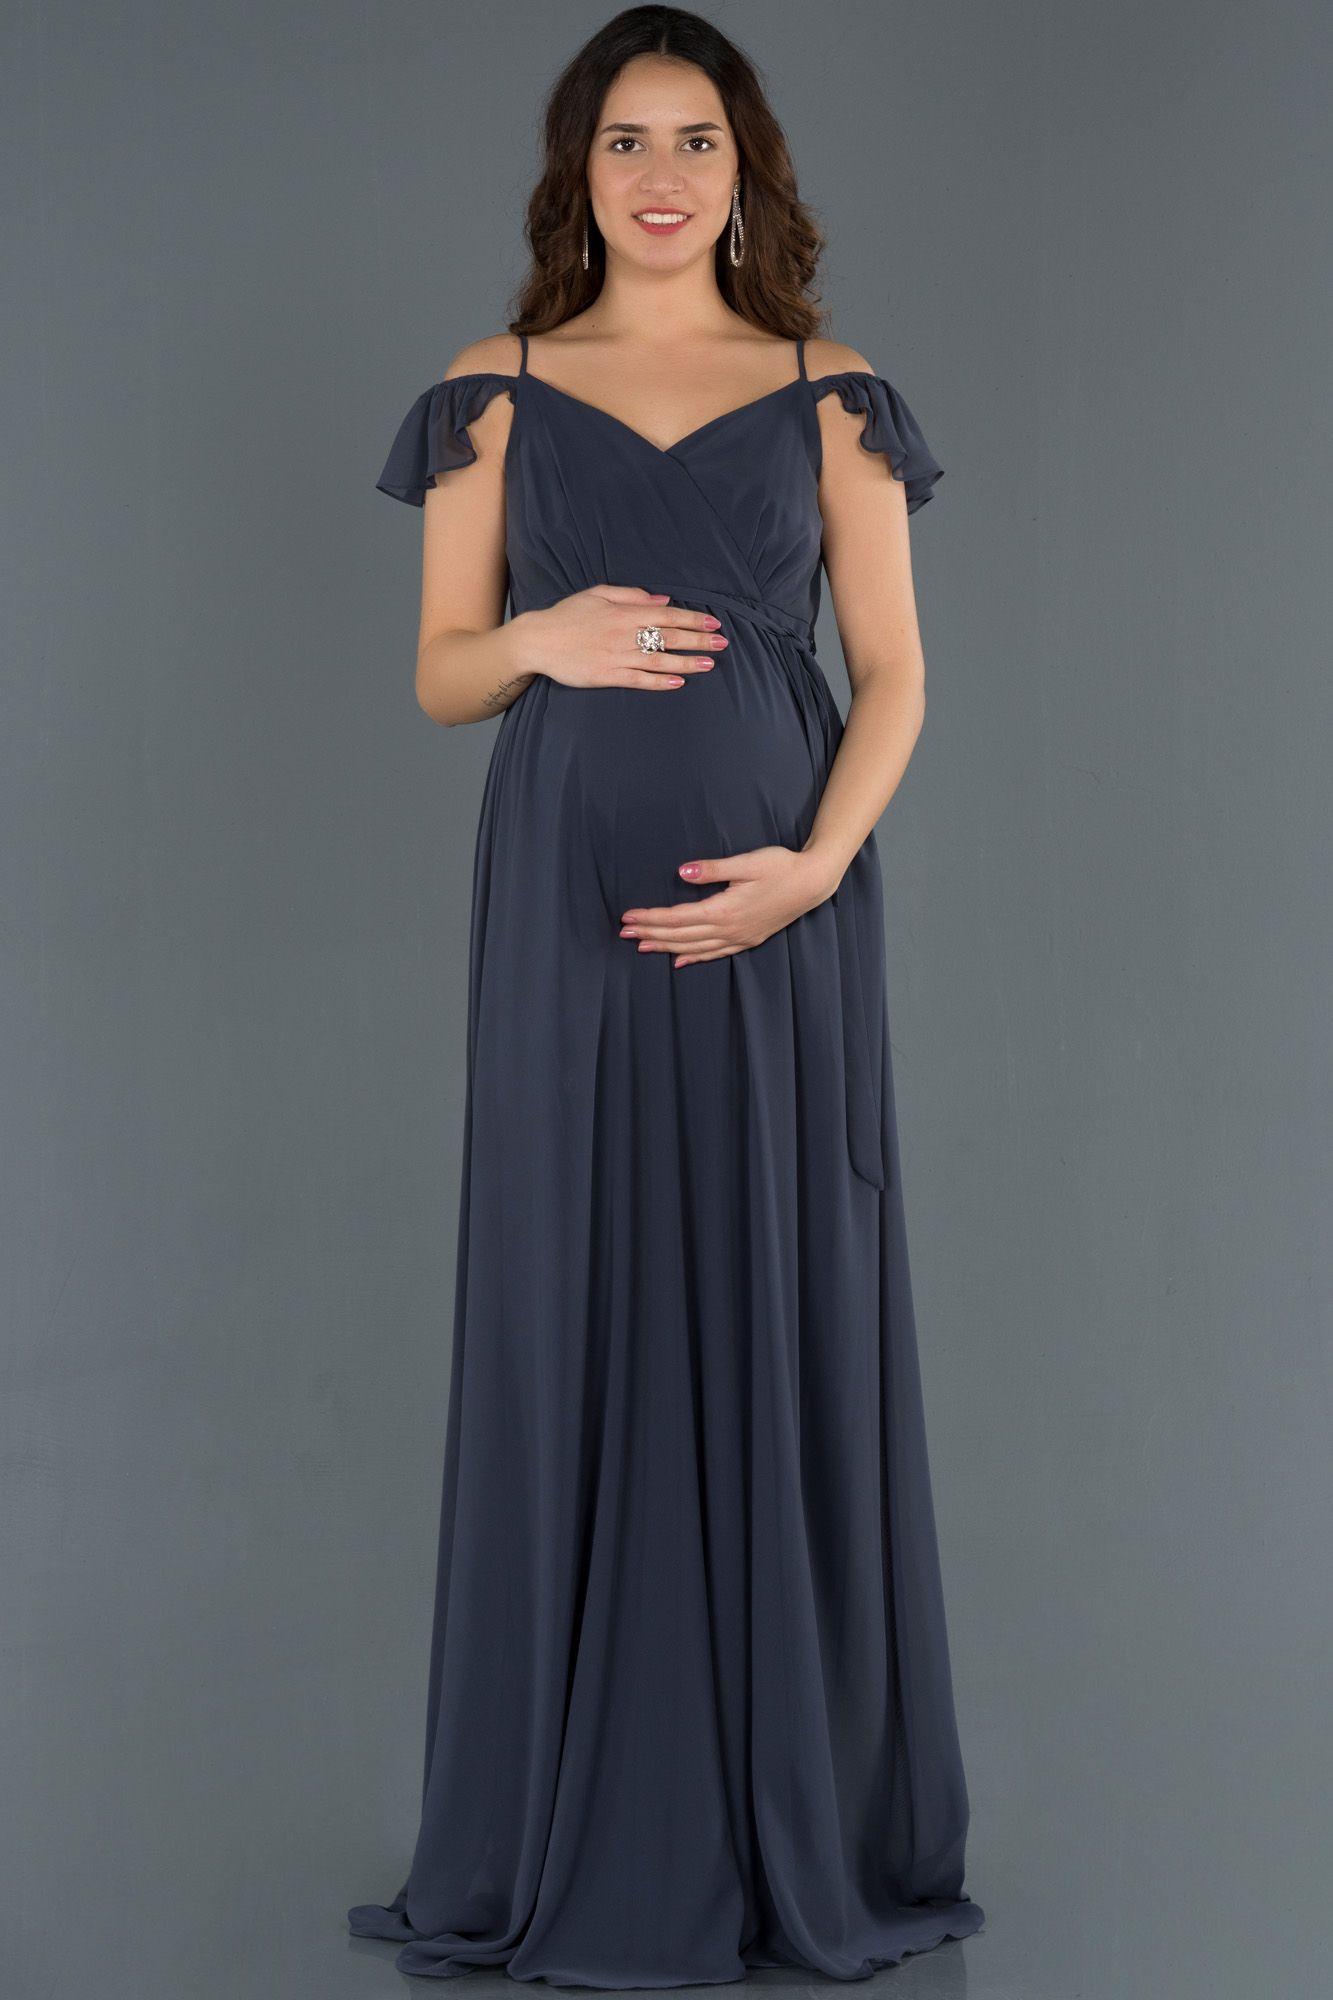 Indigo Kollari Volanli Hamile Abiye Abu756 2020 Elbise Modelleri Elbise The Dress